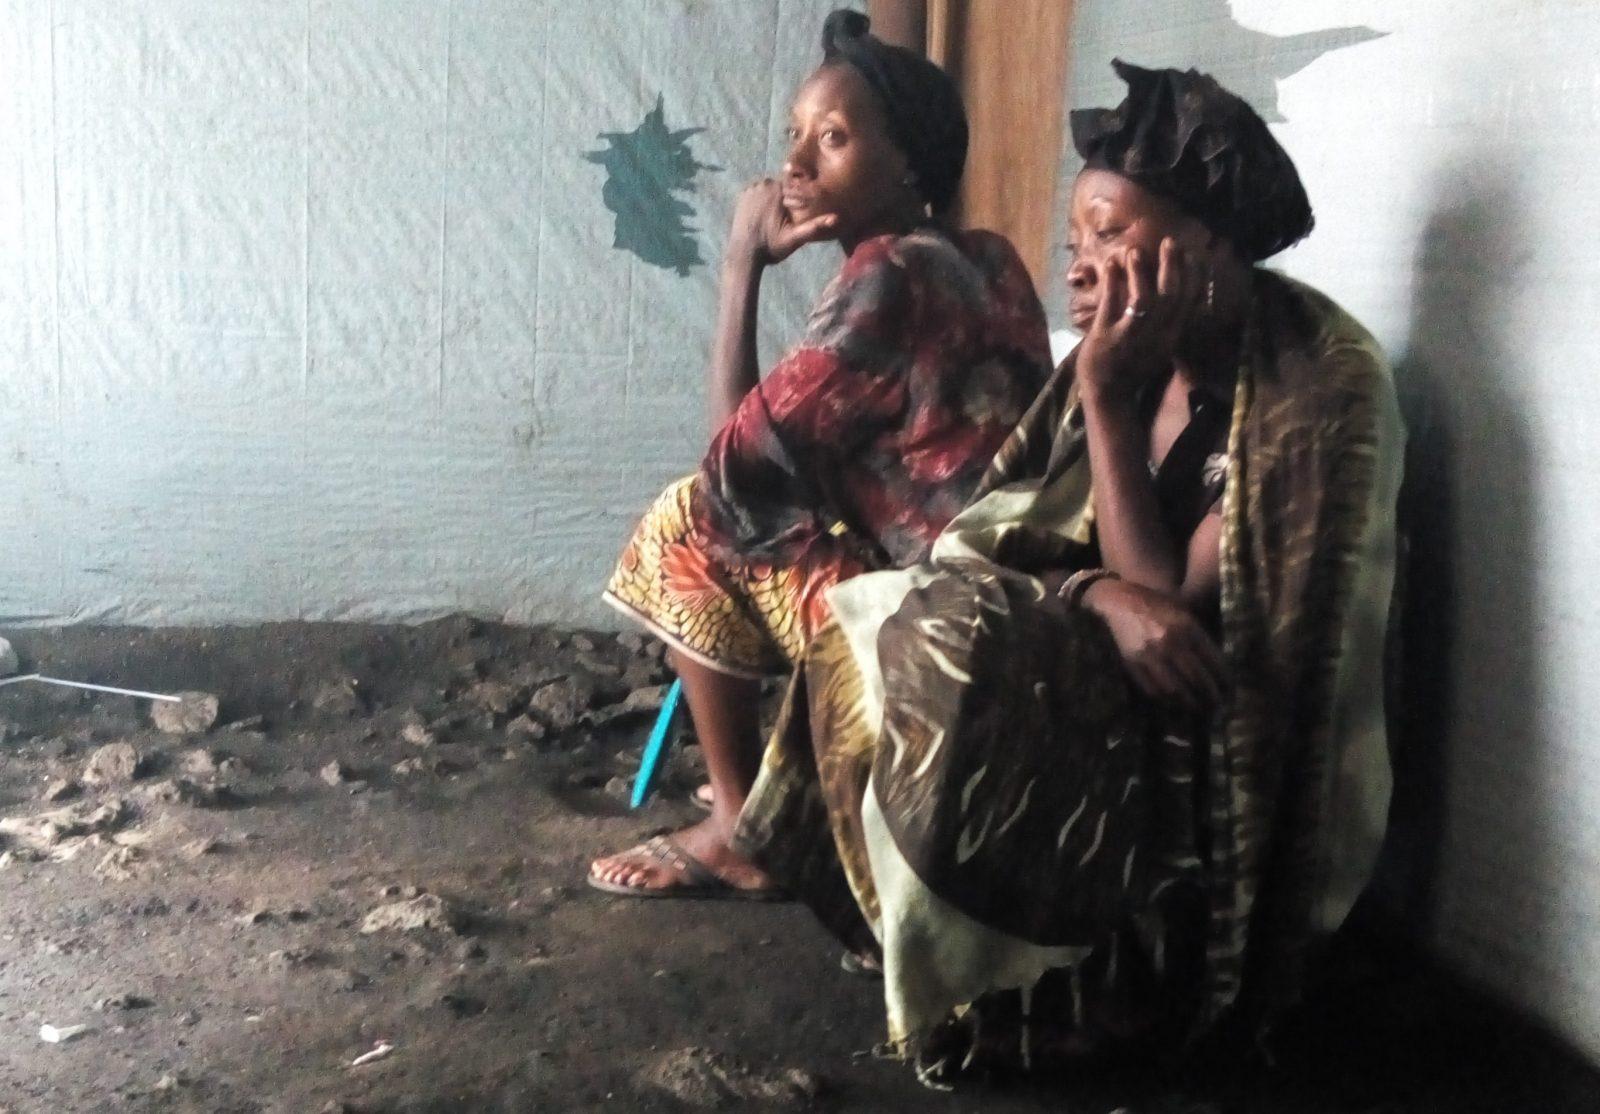 08-Mars-Droits-journee-femmes-emancipation-